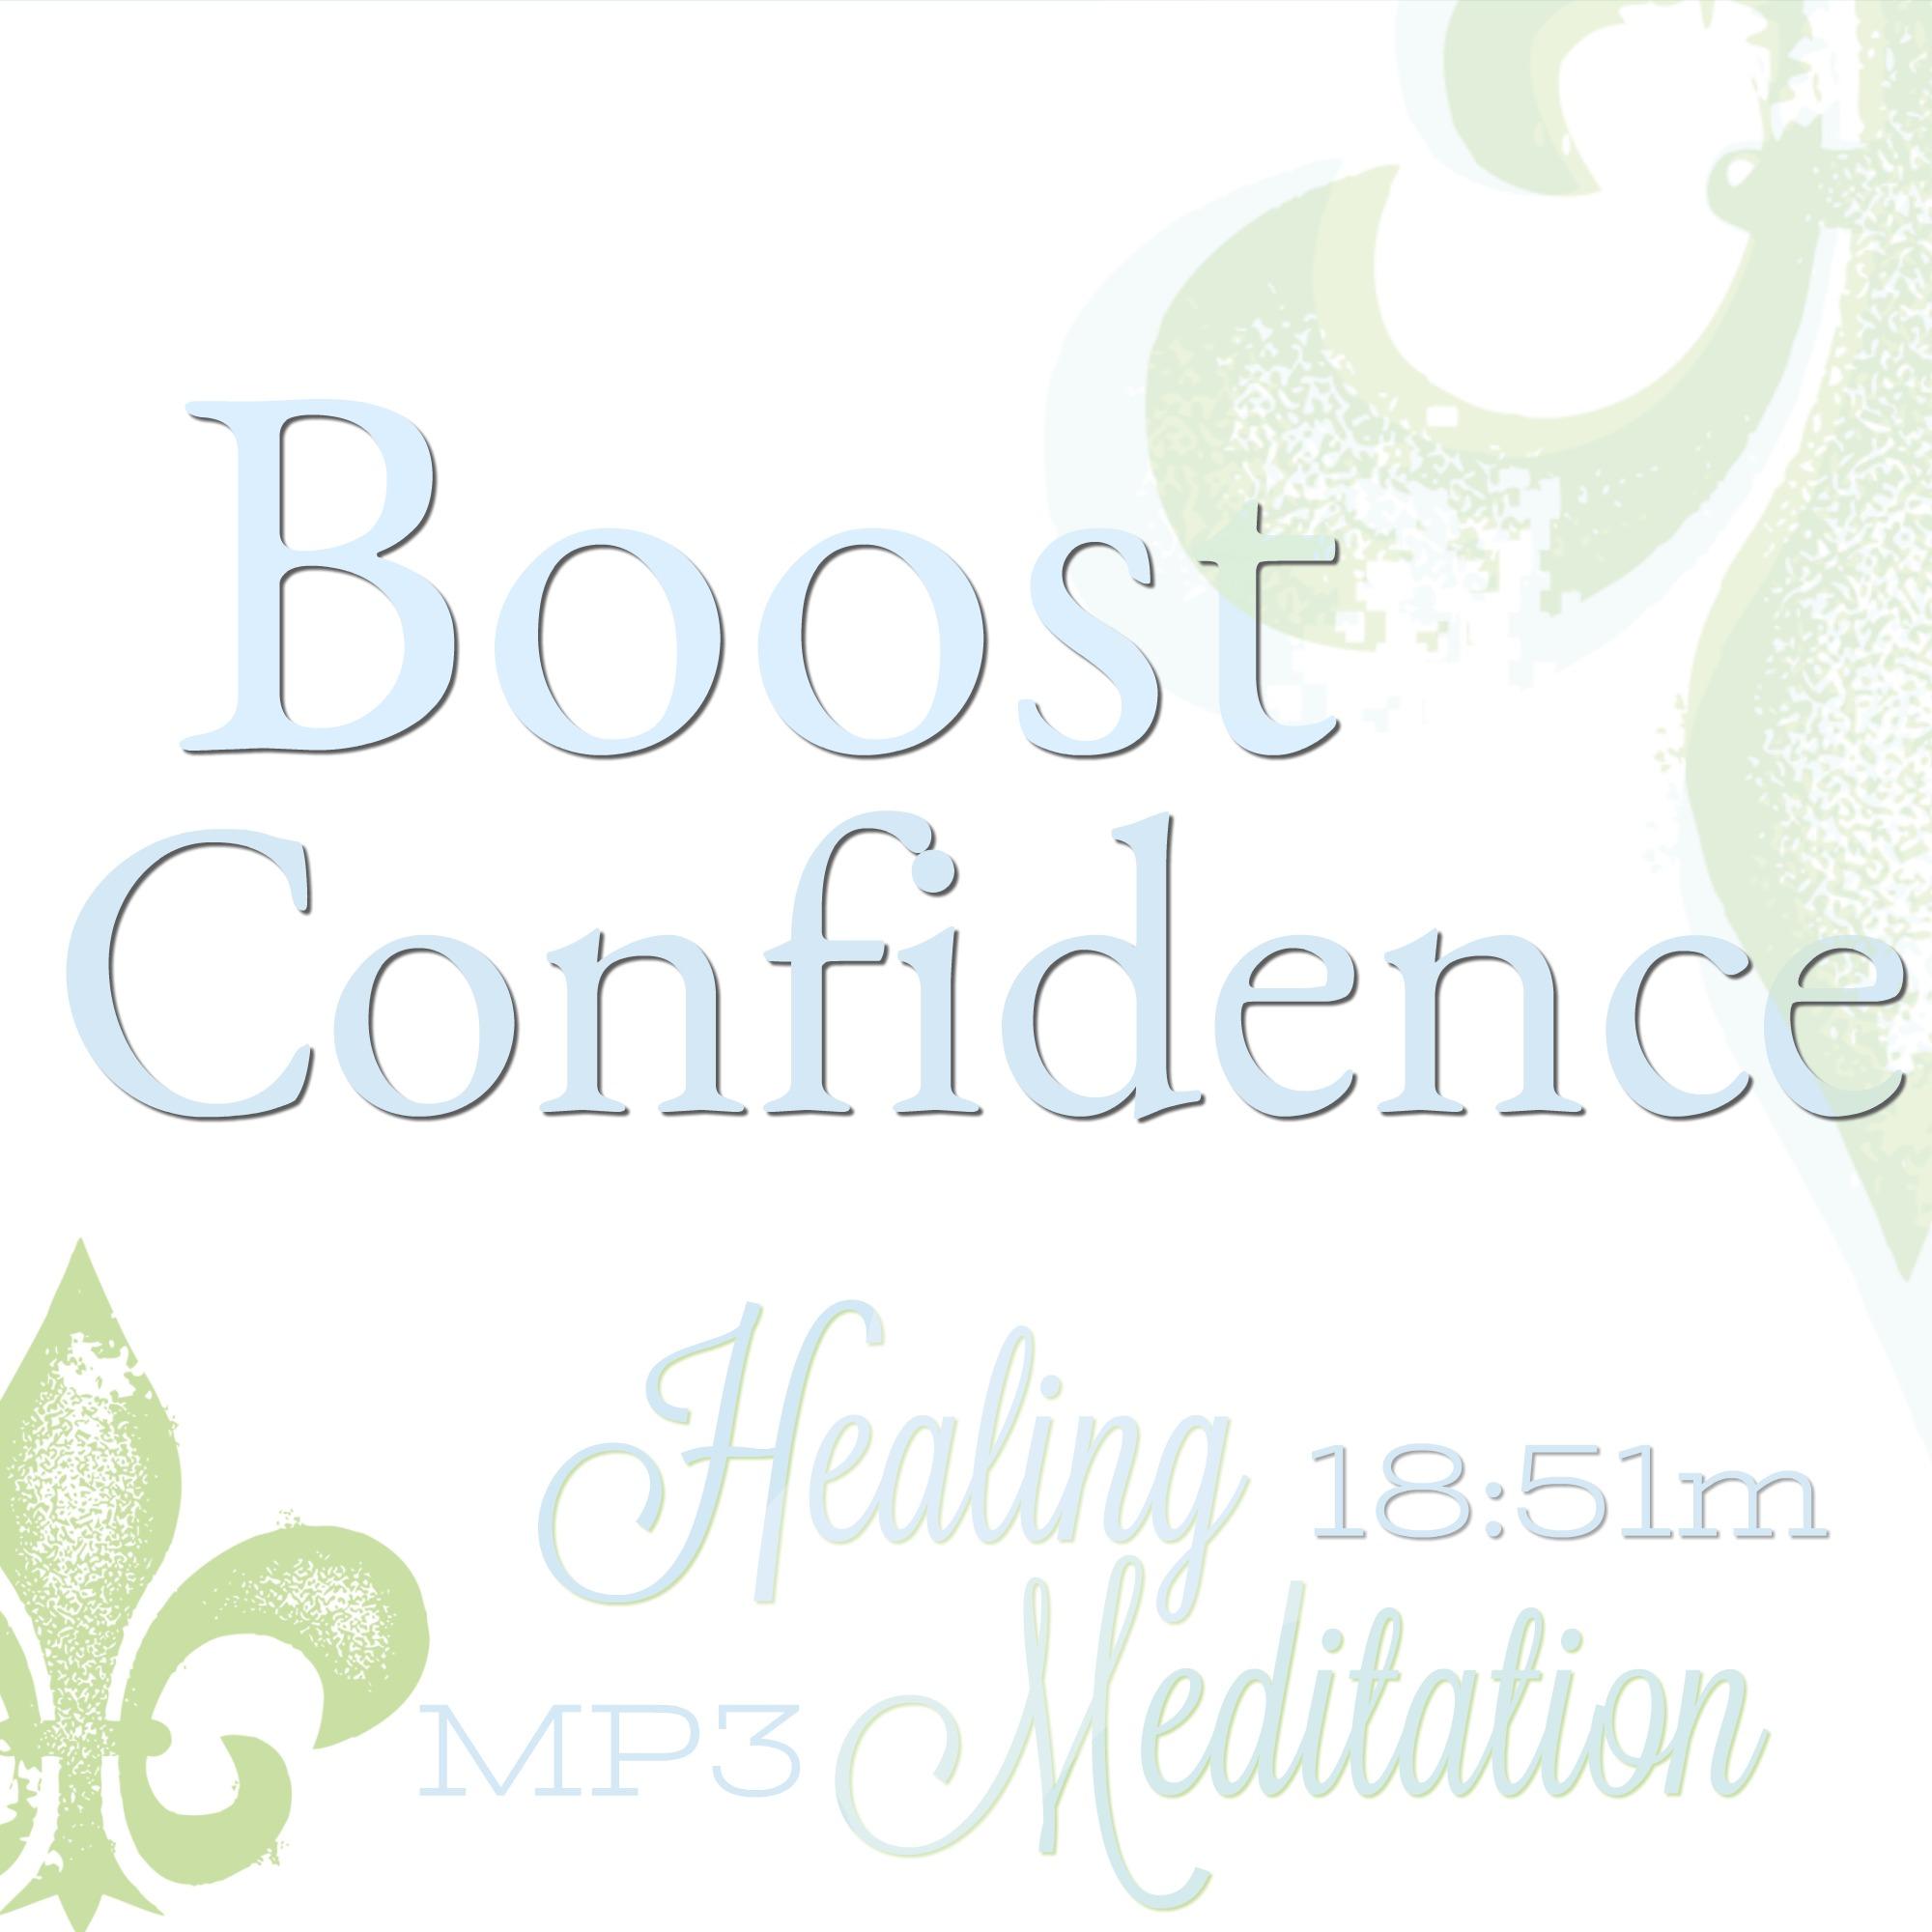 Confidence meditation, Self Esteem meditation, more confidence meditation, boost confidence meditation